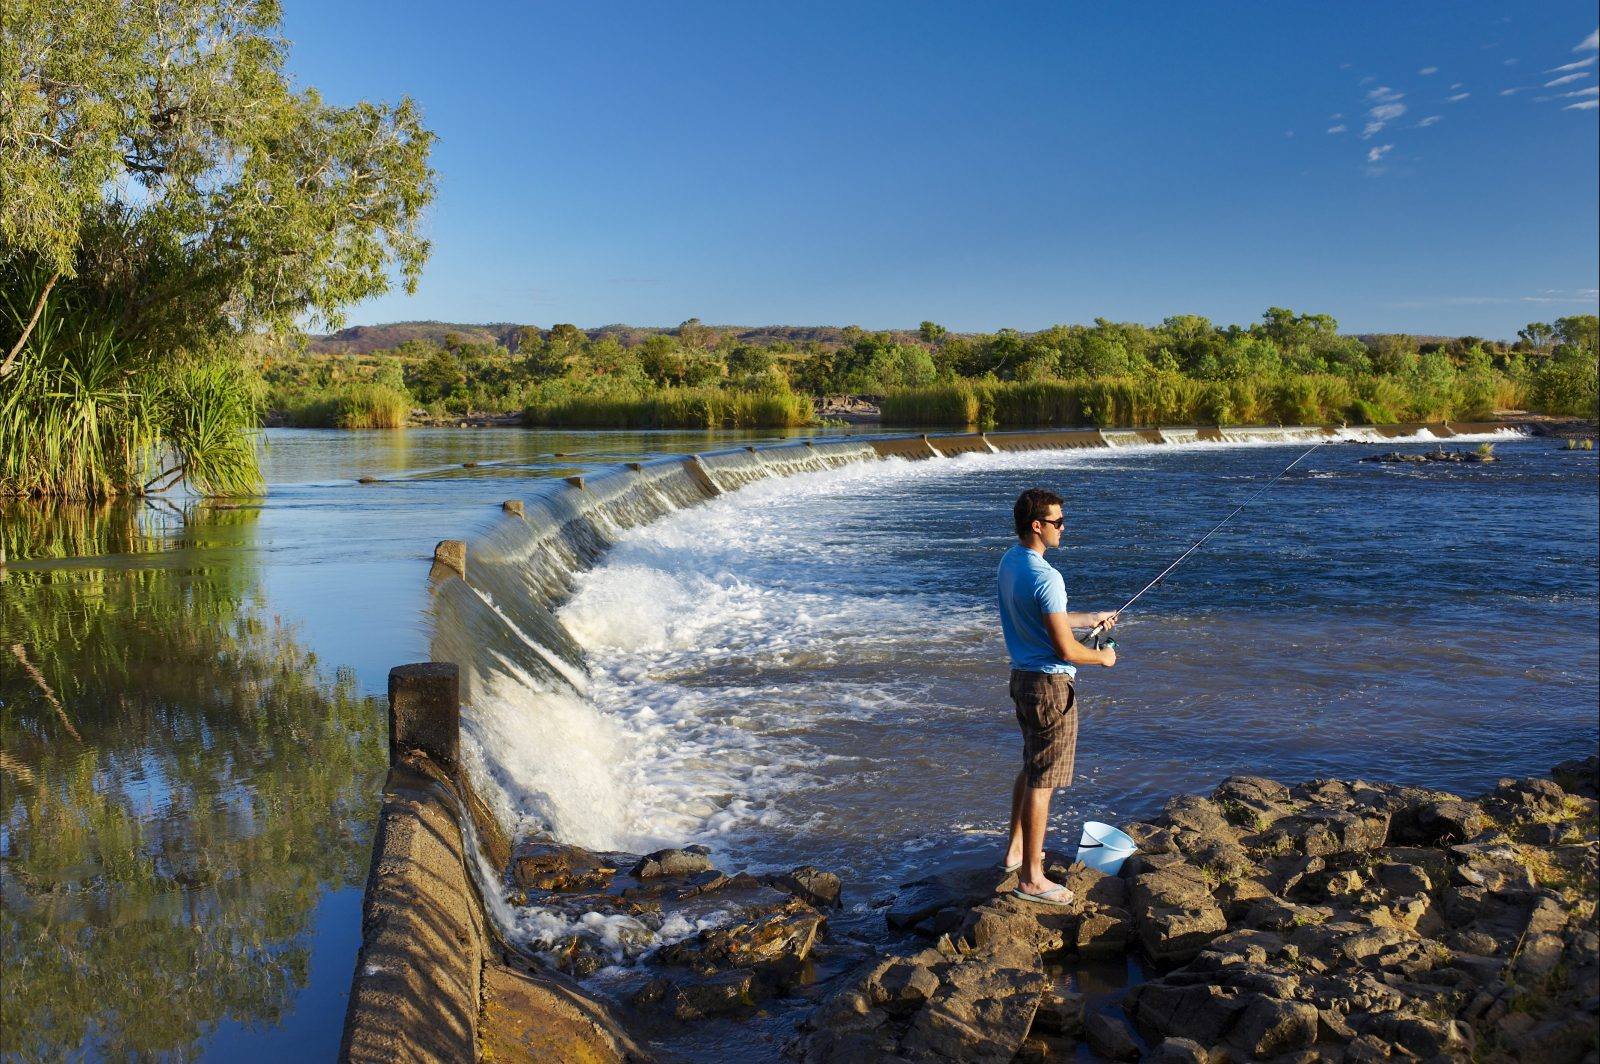 Ivanhoe Crossing, Kununurra, Western Australia